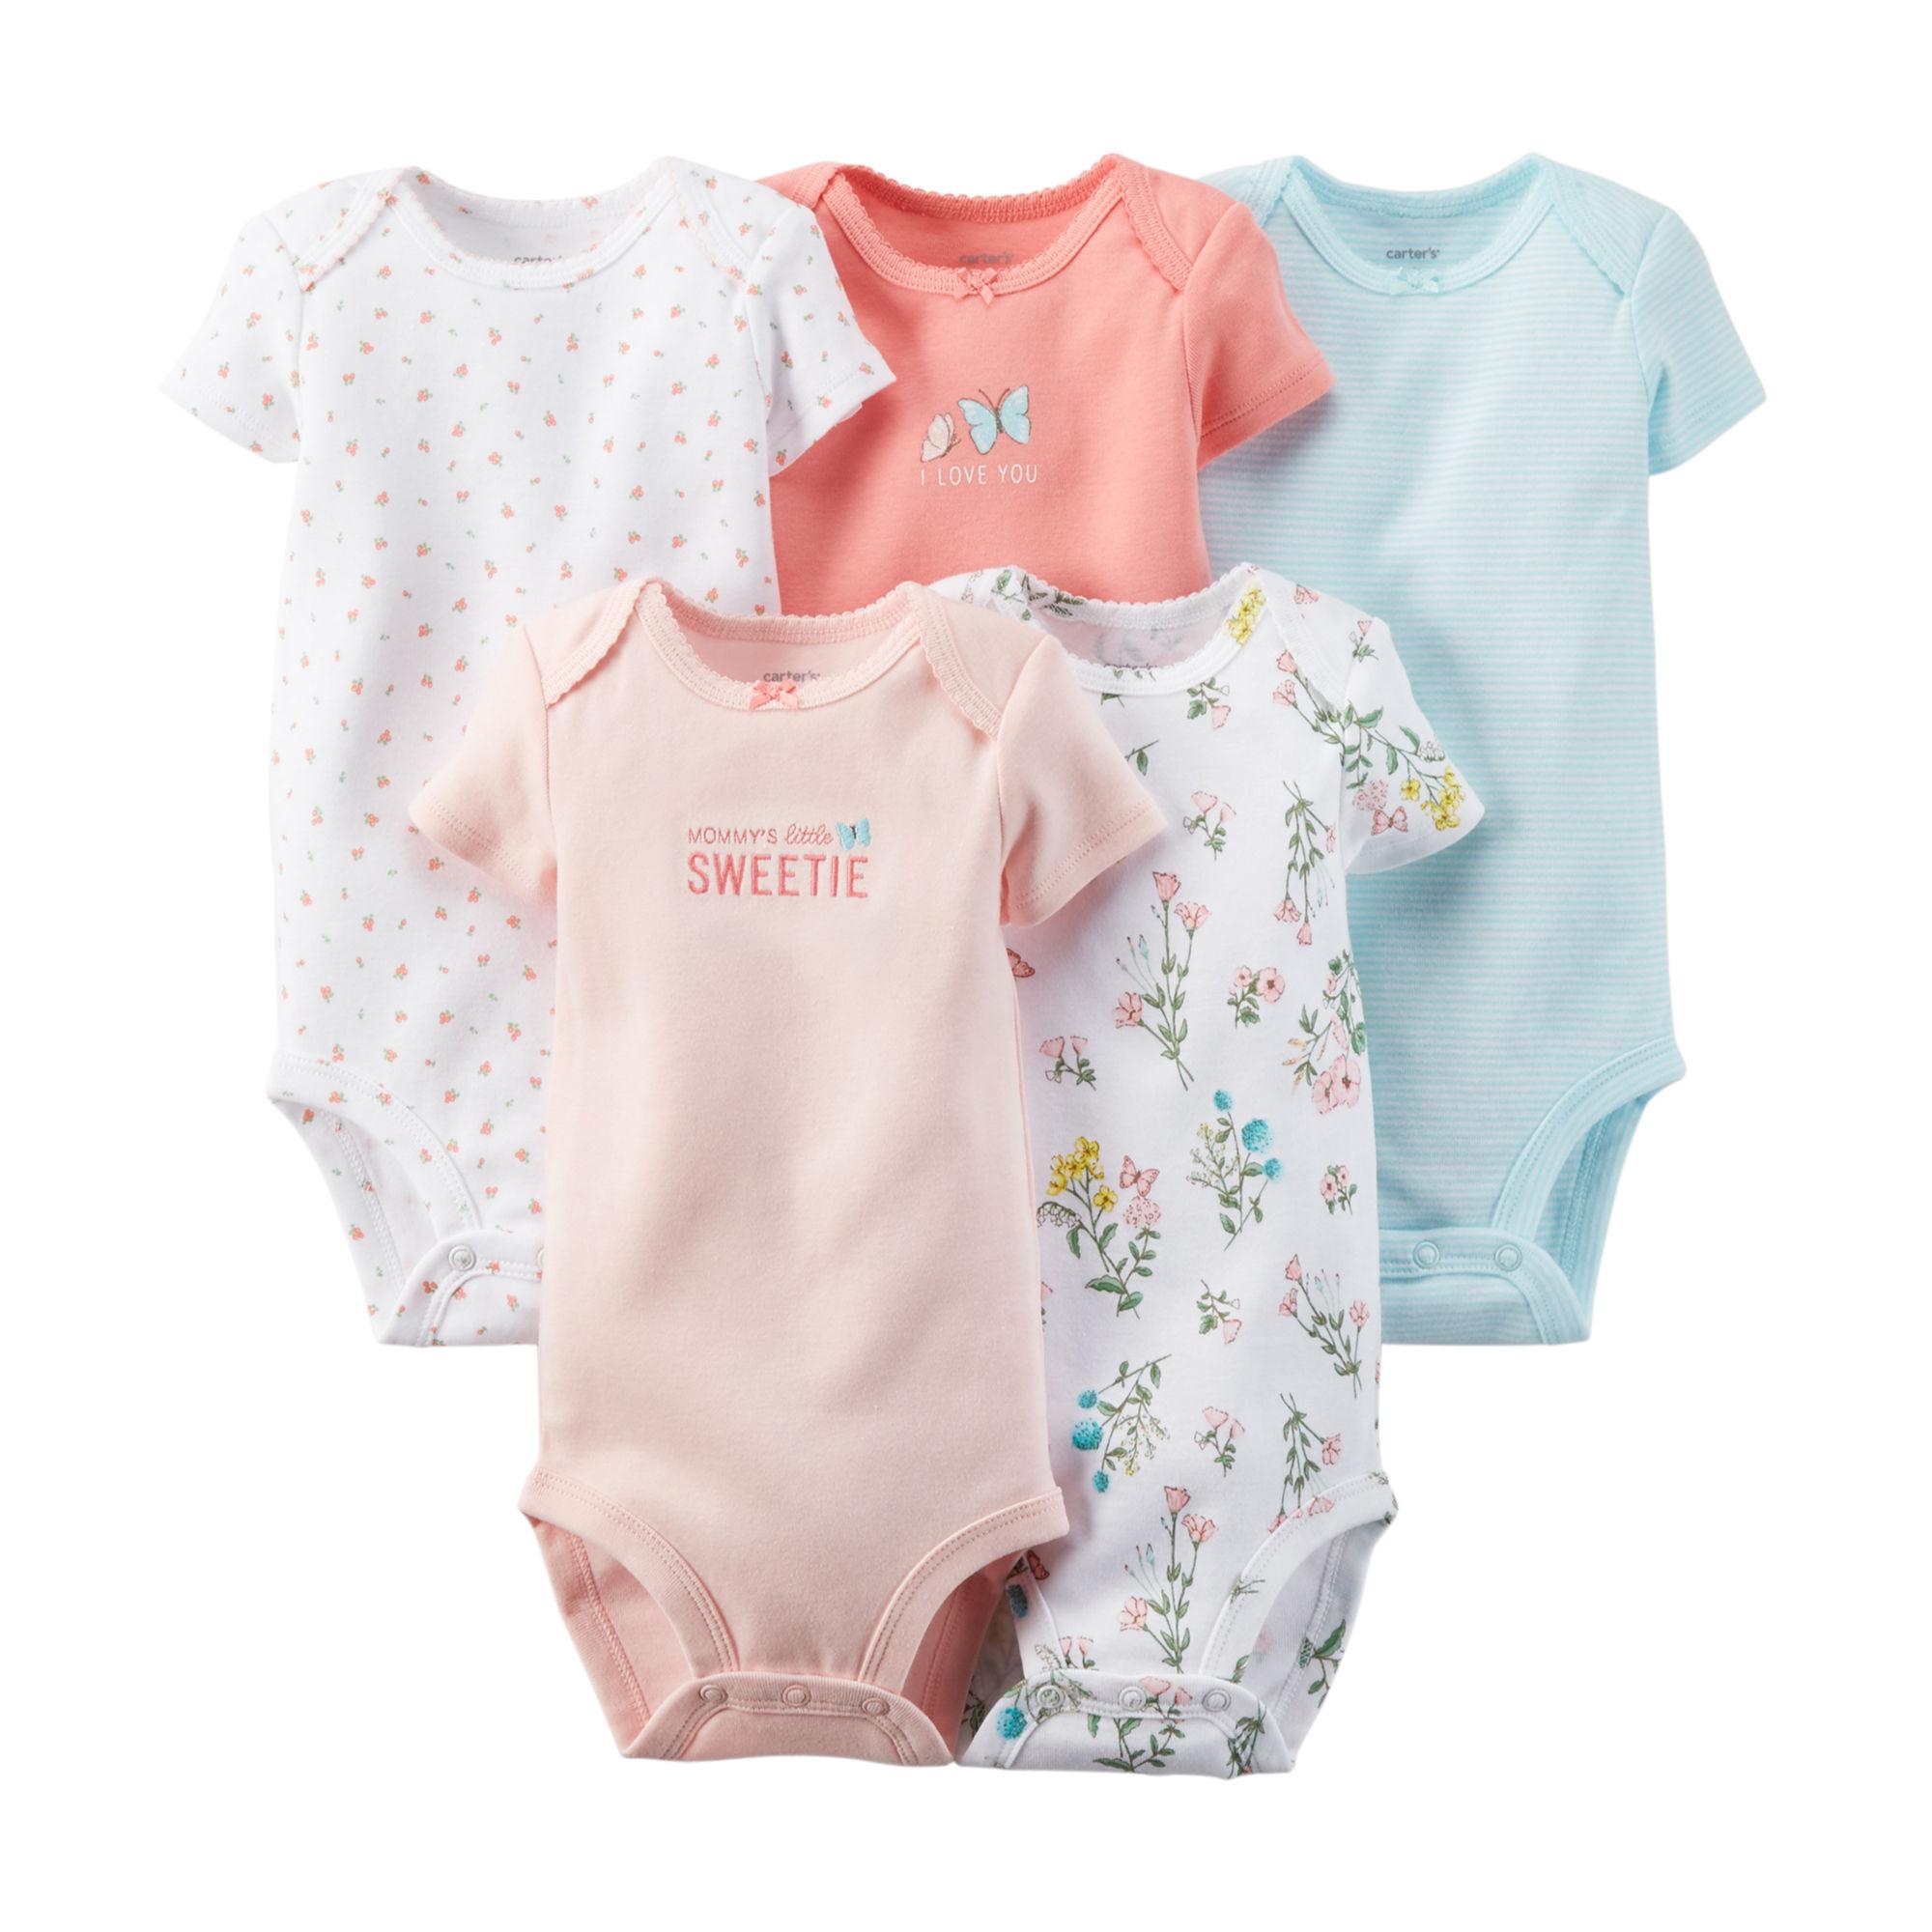 15b8d5f32 BN Carter's 5-Pack Short-Sleeve Bodysuits, Babies & Kids on Carousell